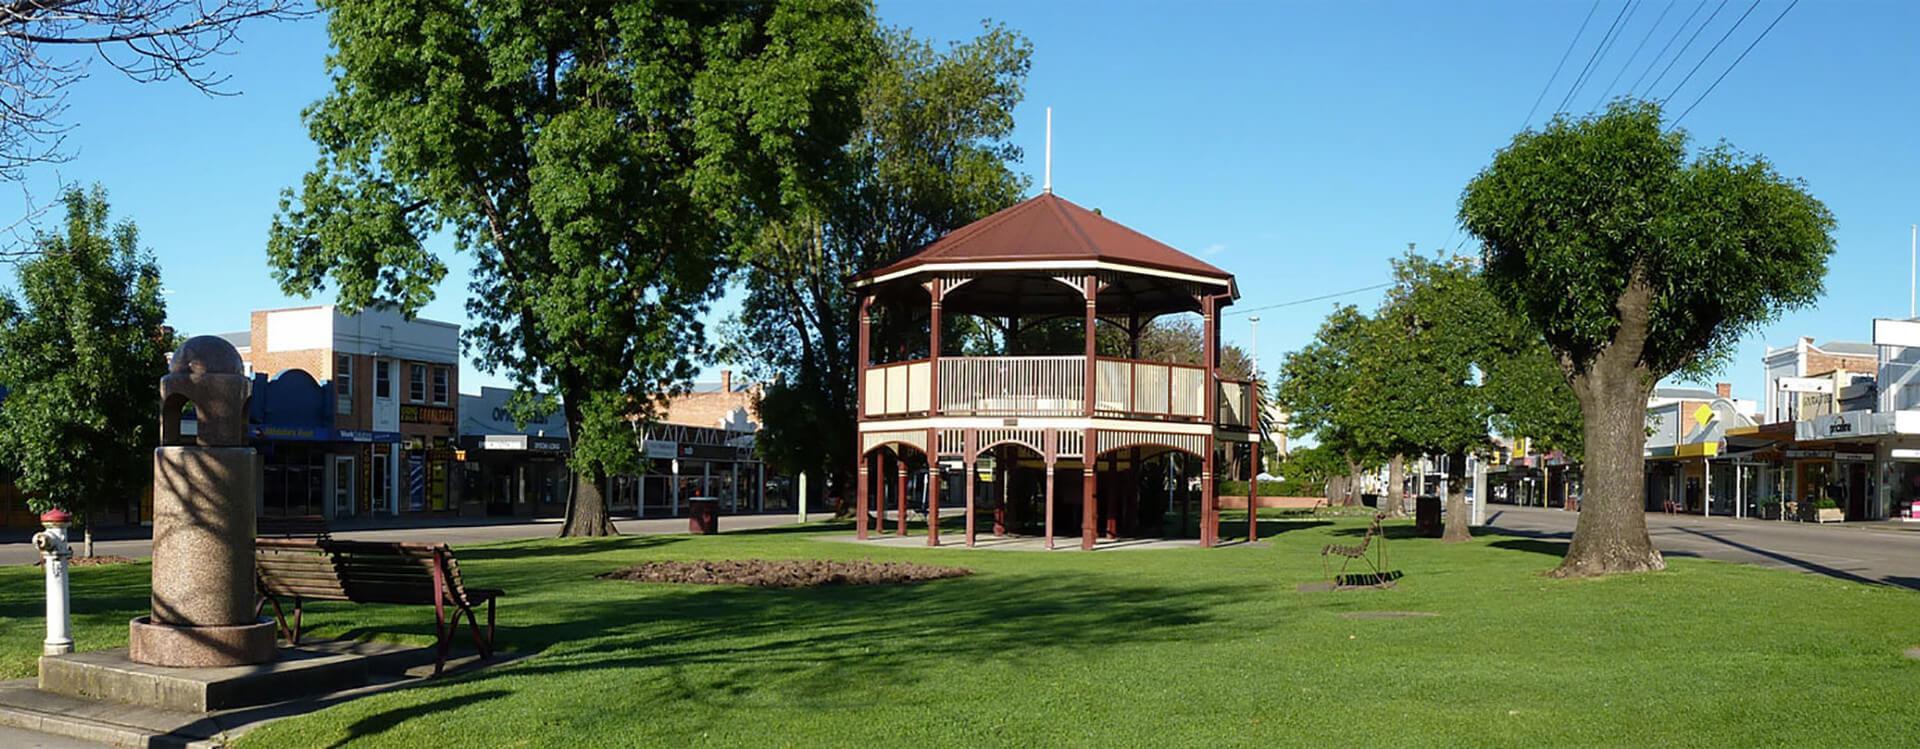 Bairnsdale Rotunda - Colonial Motor Inn Bairnsdale